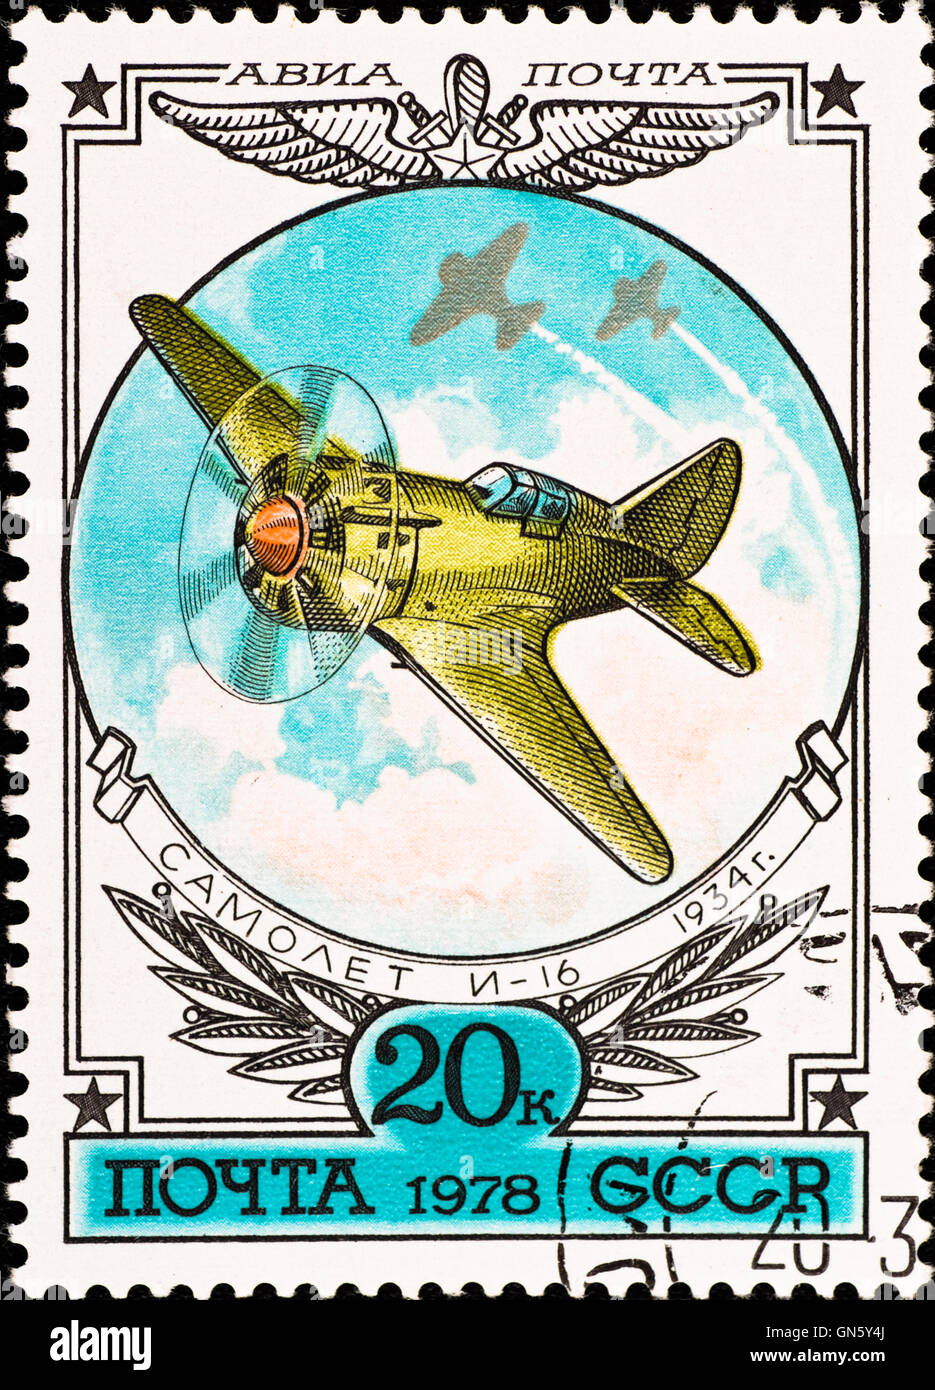 postage stamp shows vintage rare plane 'I-16' - Stock Image